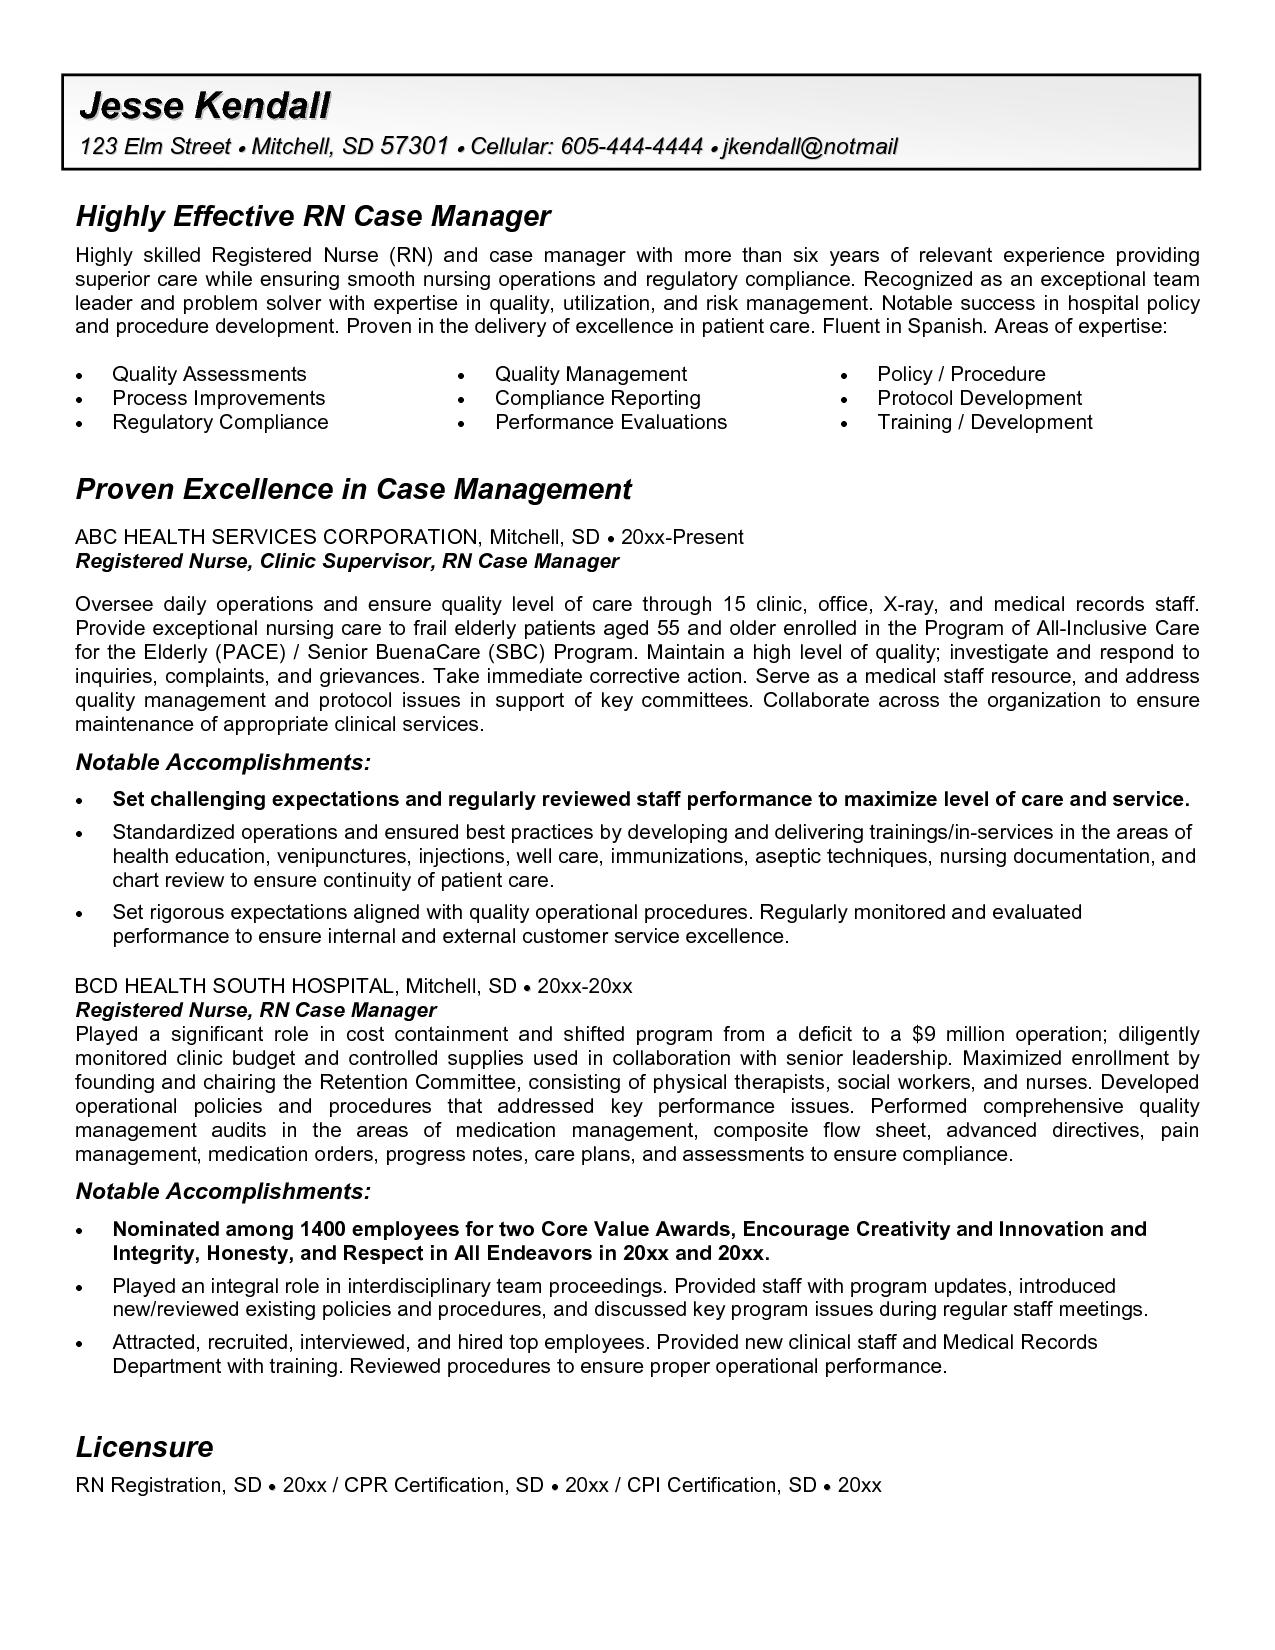 resume for heals schoolnursecoverletter phpapp application letter ...